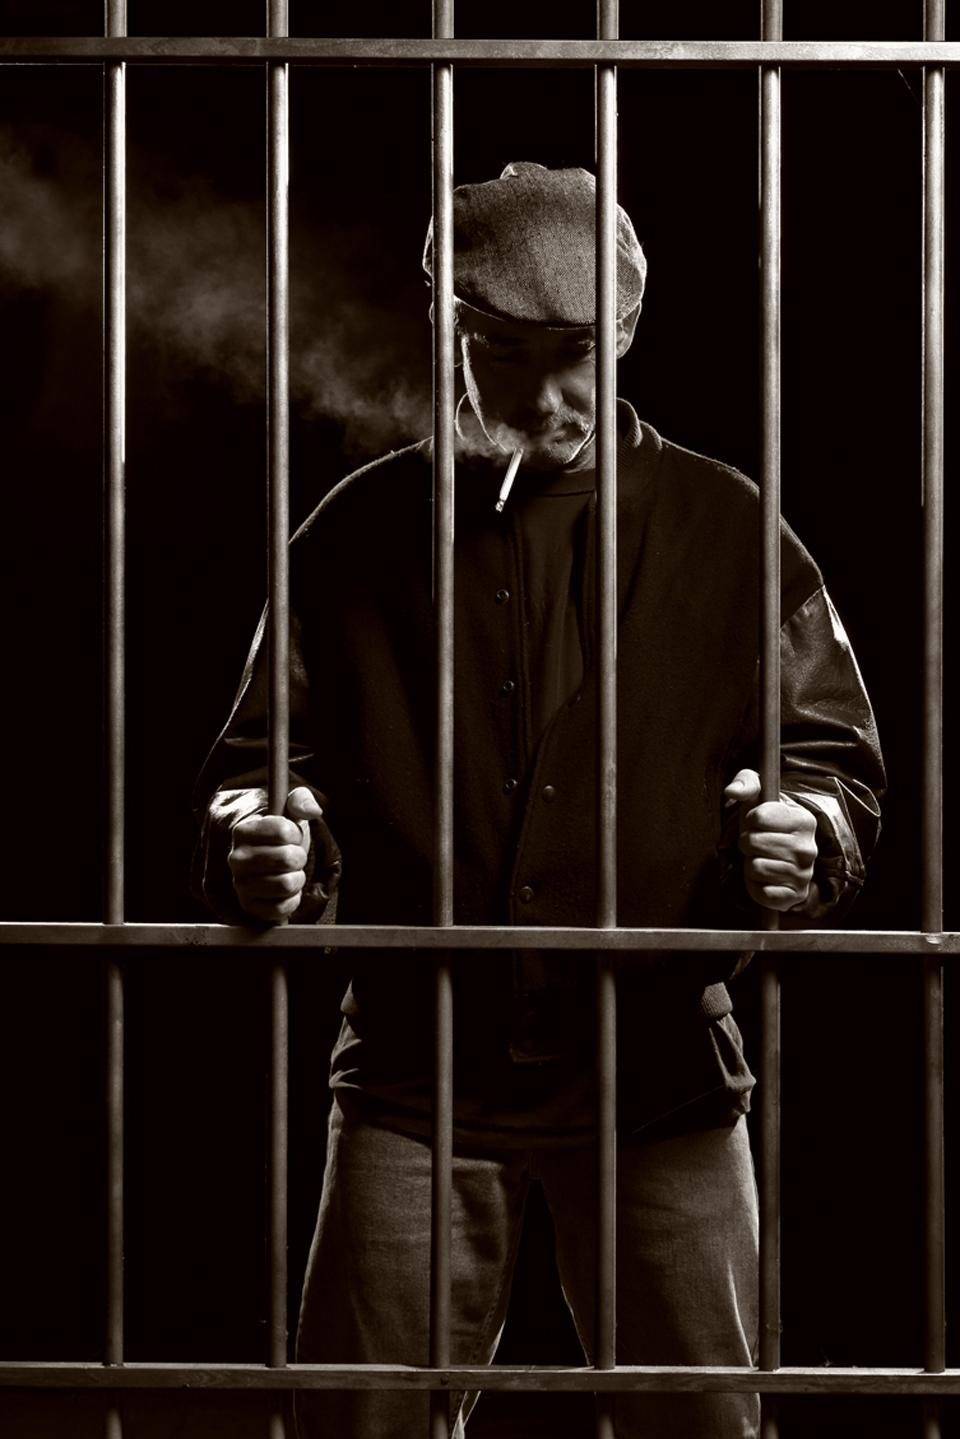 Doug_Jail Cell_B&W.jpg